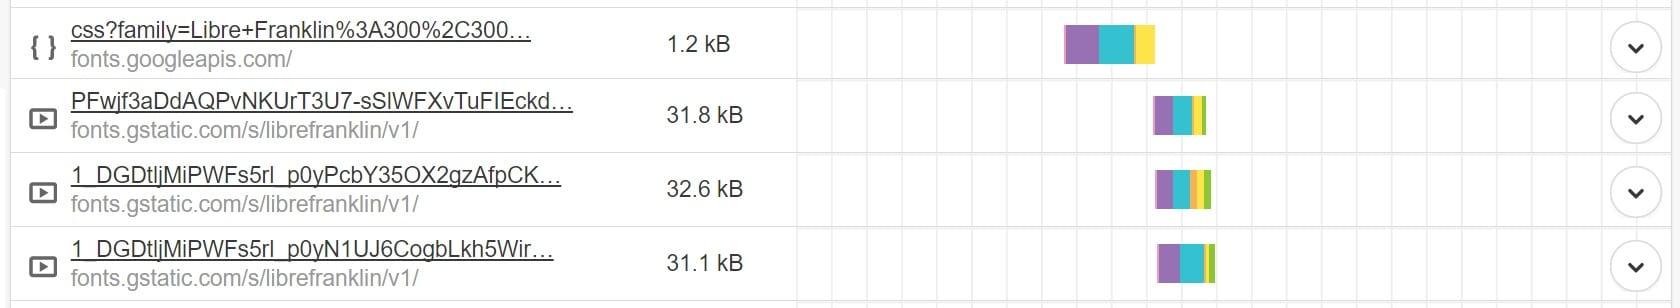 Pedidos HTTP da fonte Google